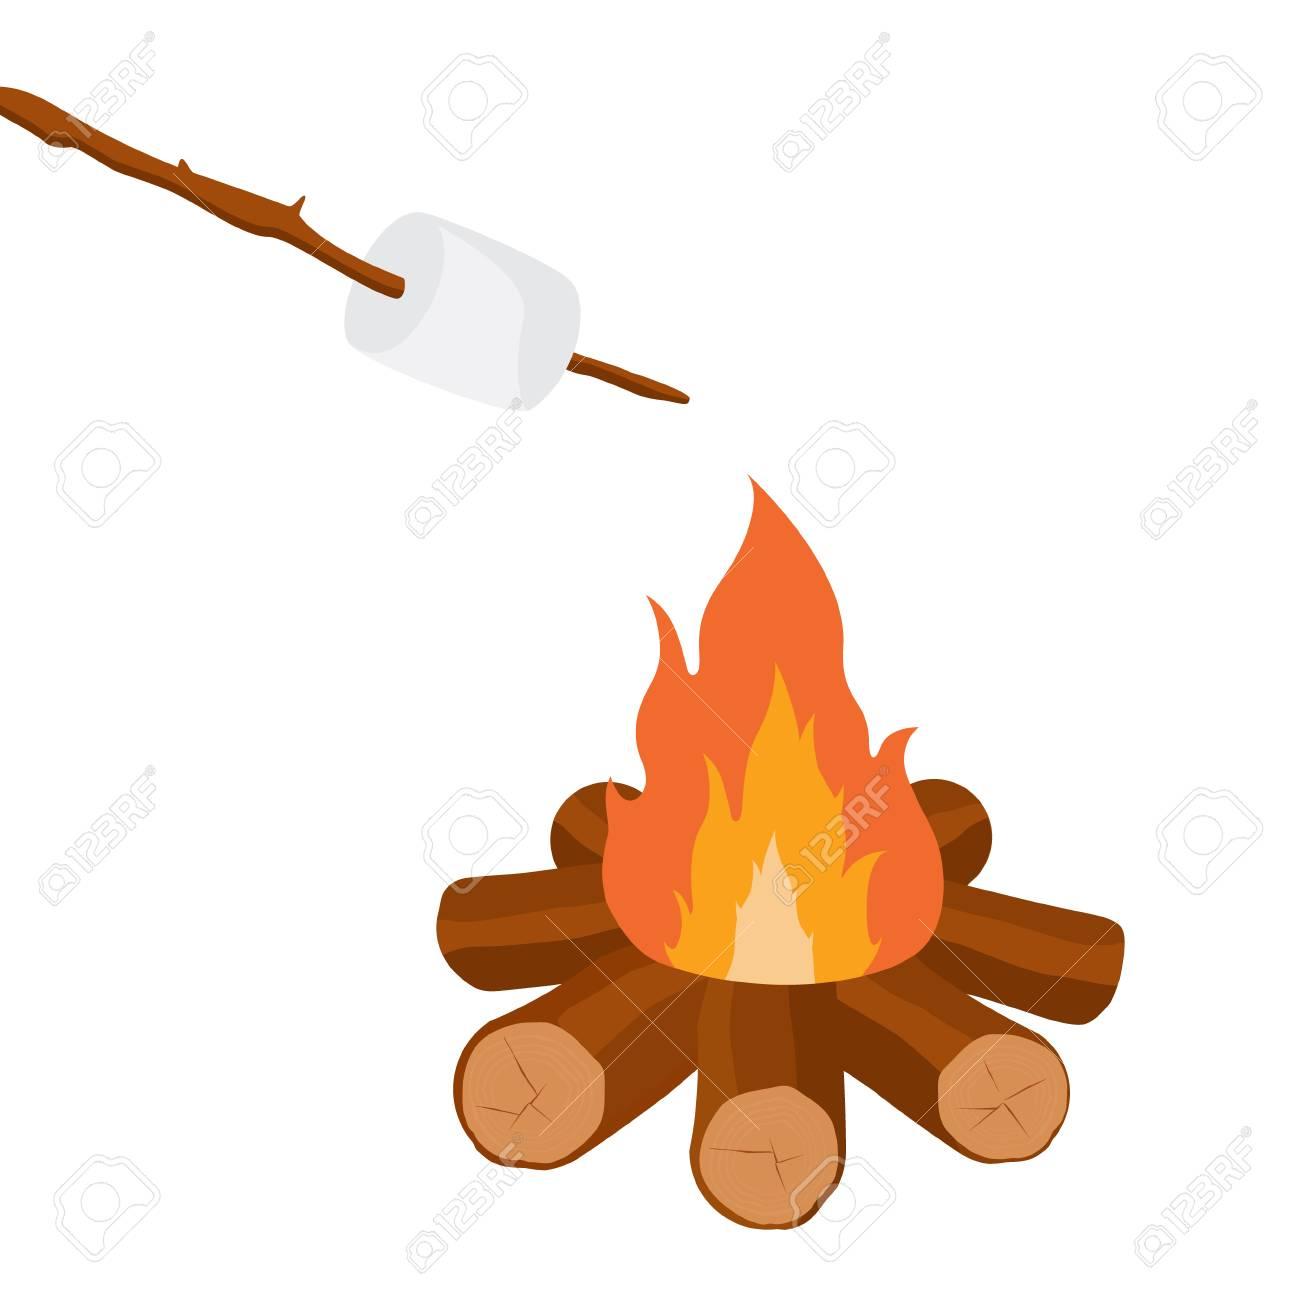 Vector Illustration Marshmallow On Wooden Stick Roasting Campfire